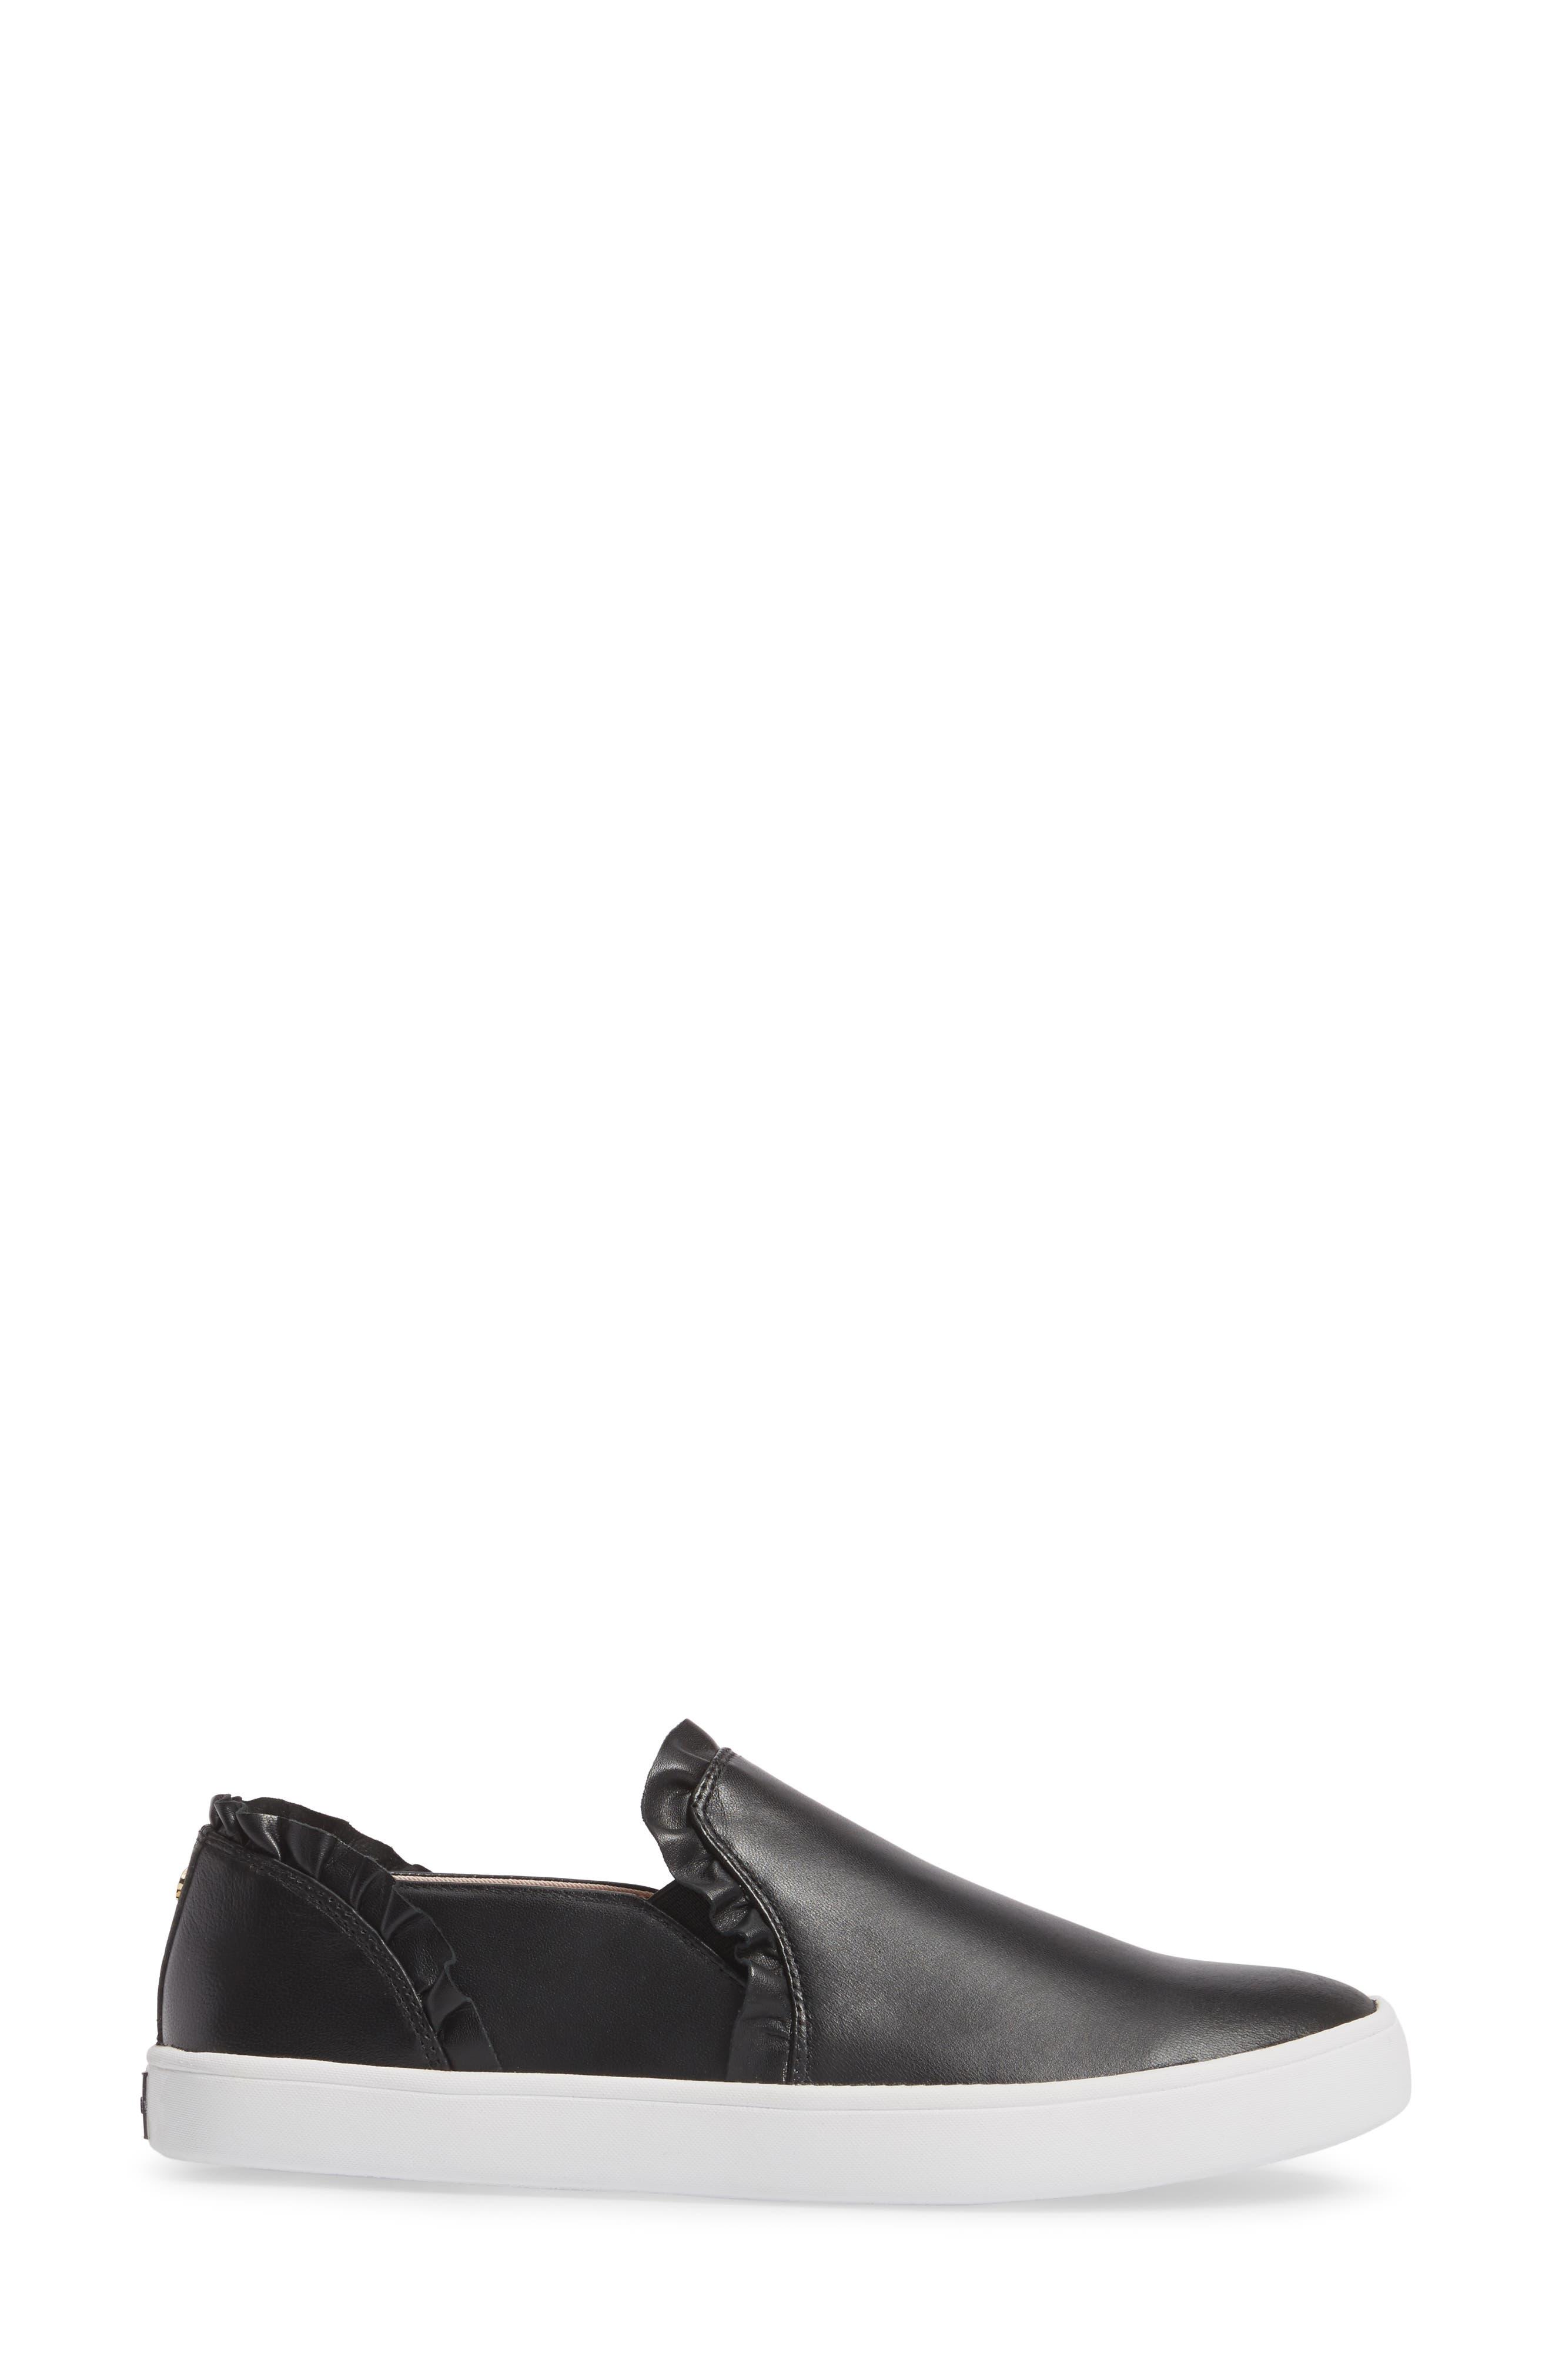 lilly ruffle slip-on sneaker,                             Alternate thumbnail 3, color,                             BLACK NAPPA